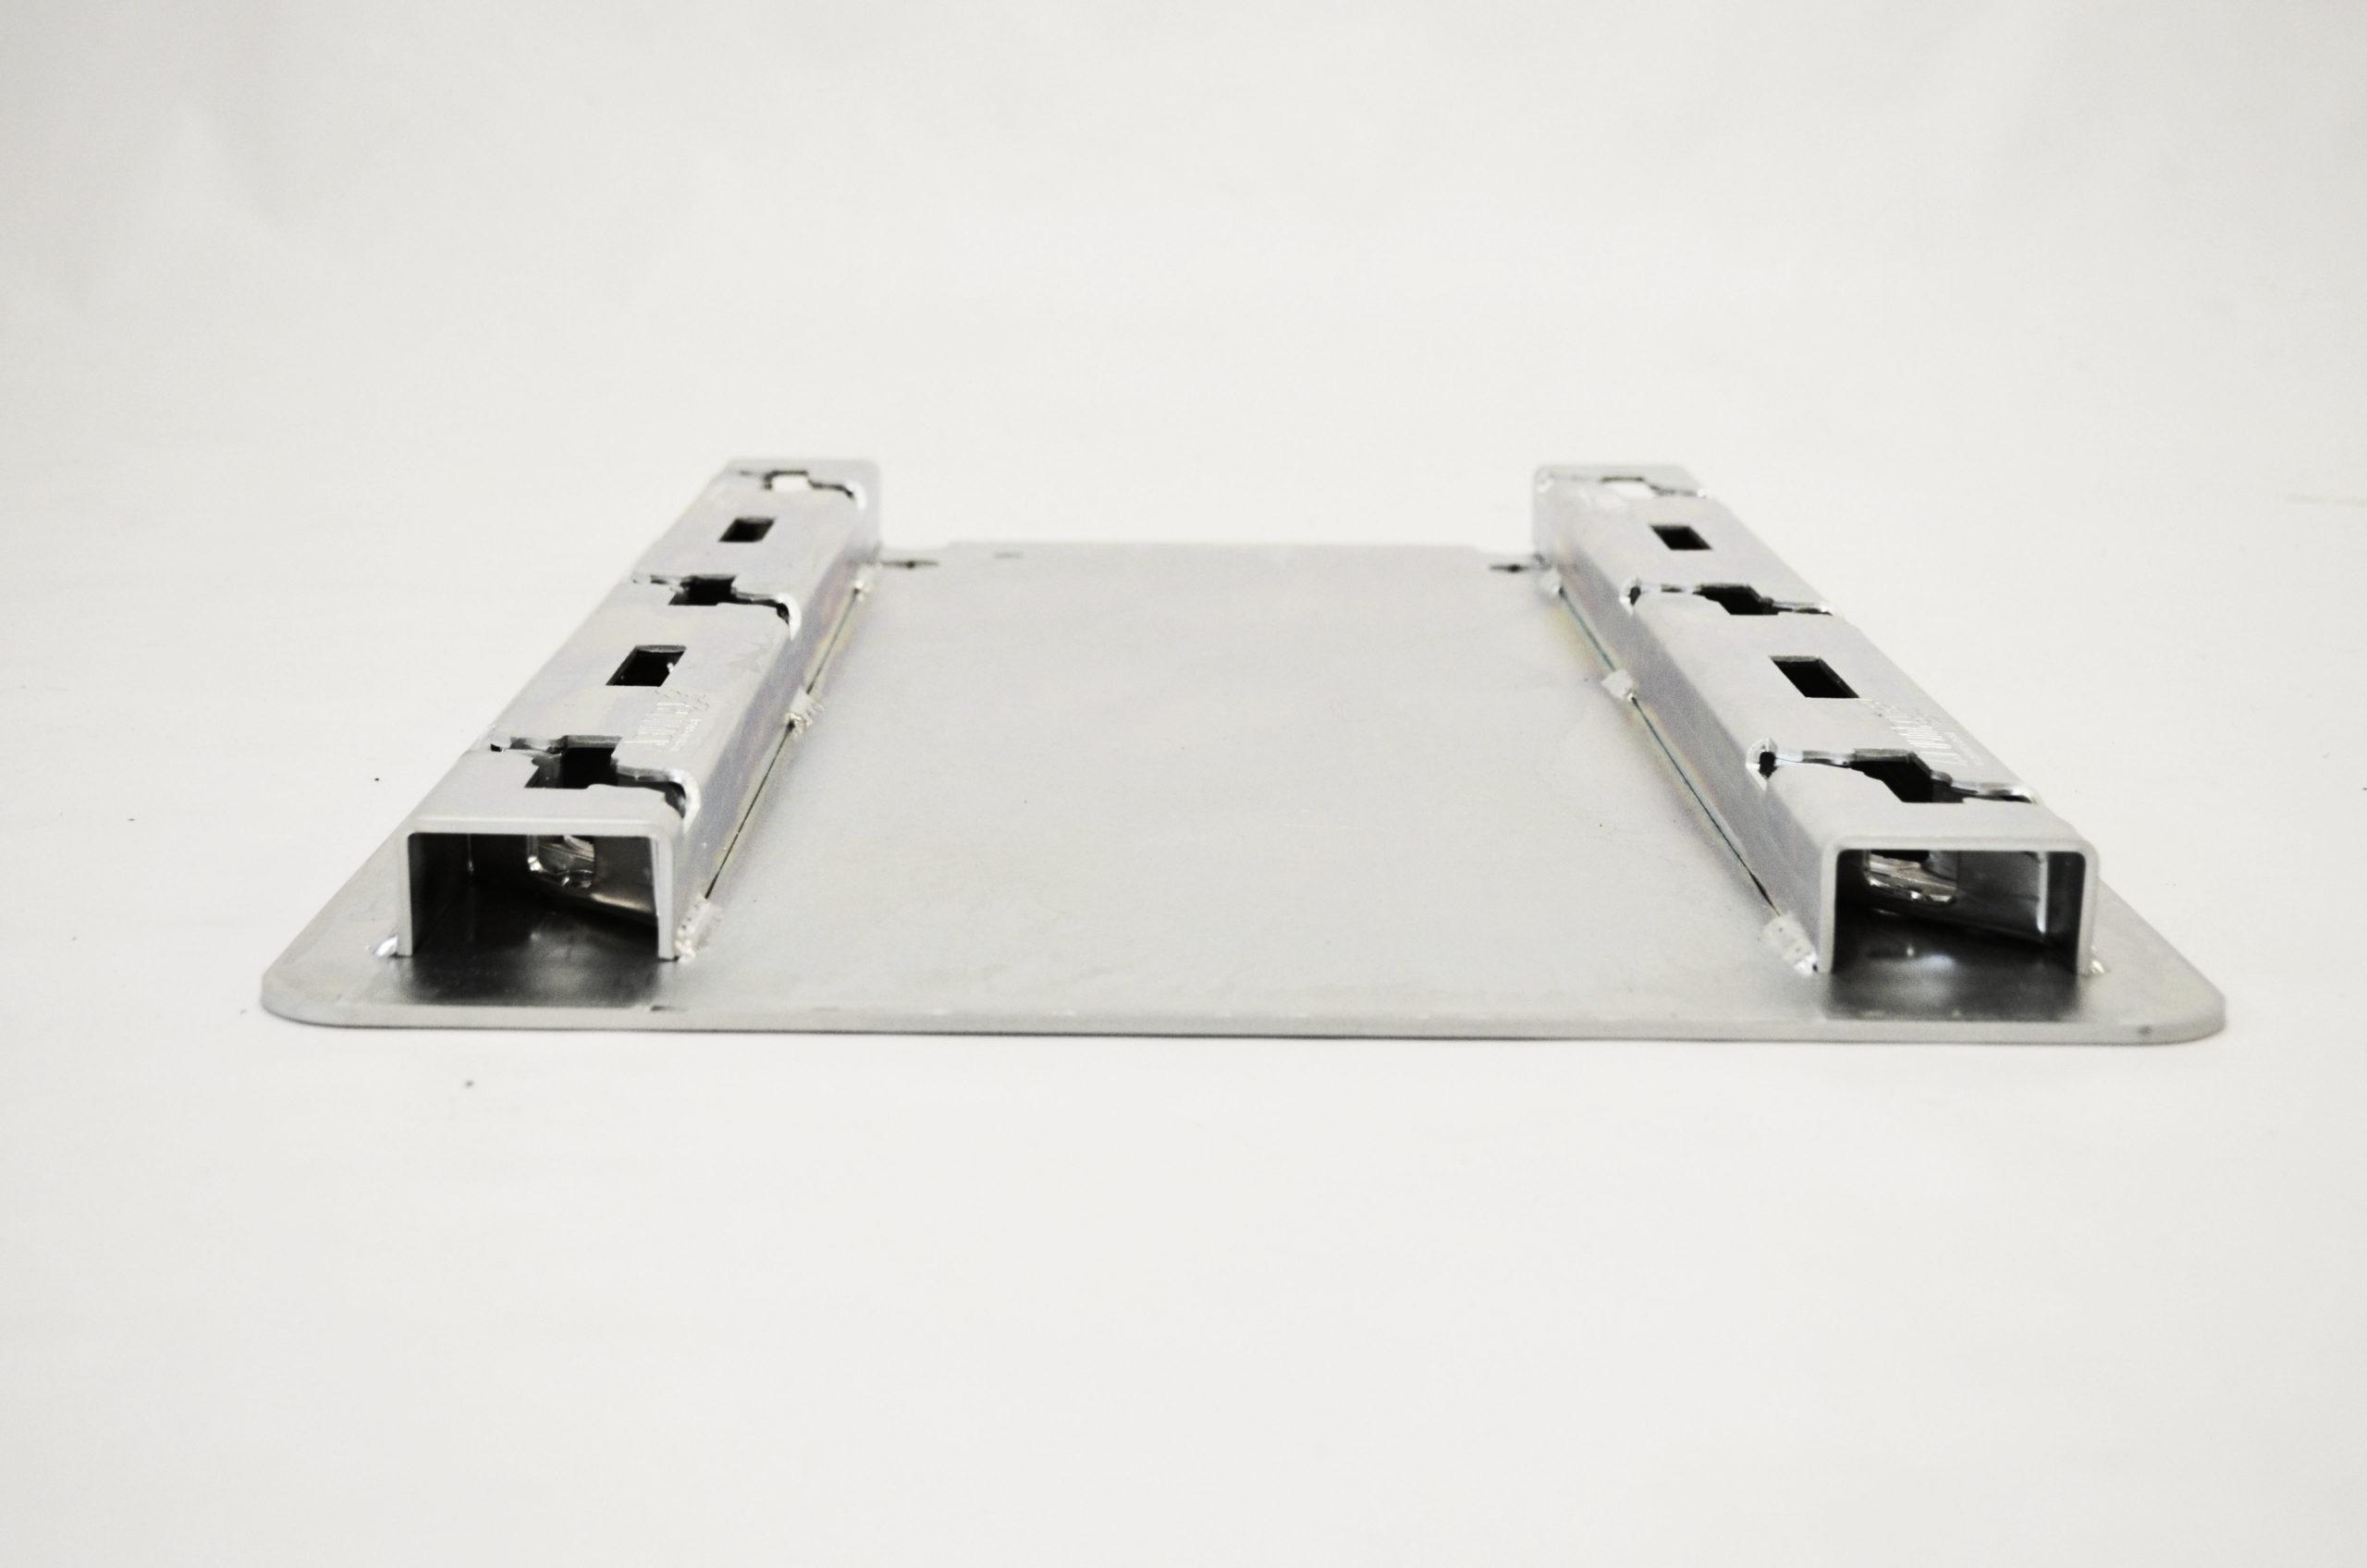 AbiliTrax Zinc Coated Seat Pod